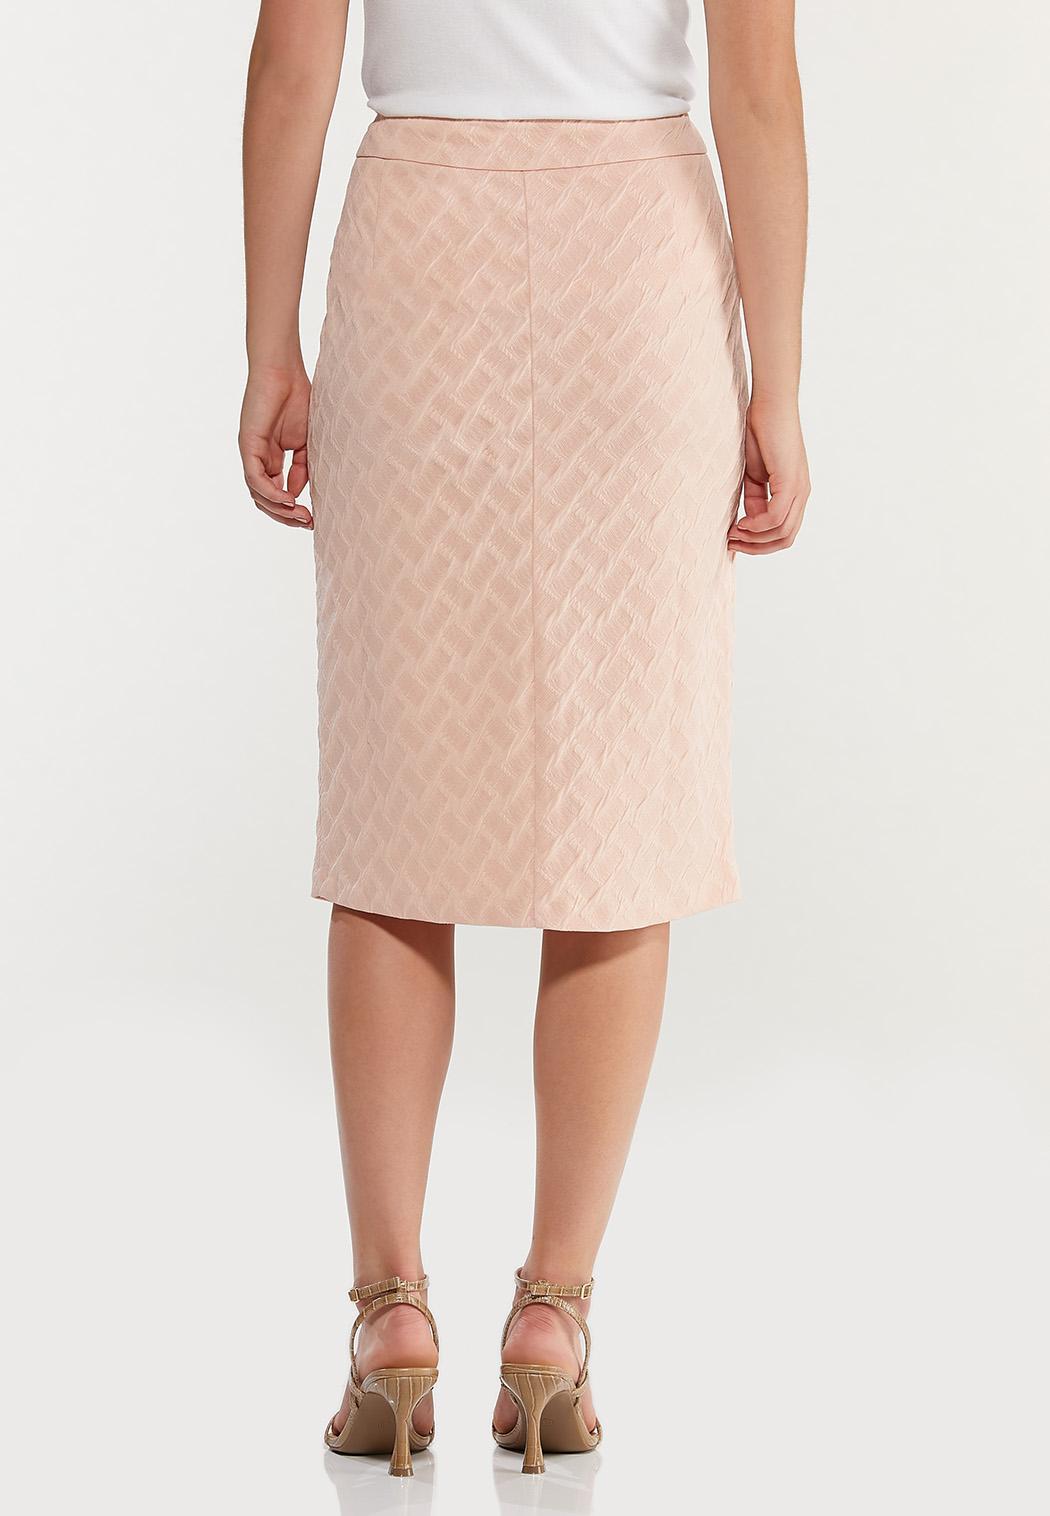 Plus Size Textured Blush Pencil Skirt (Item #44491692)